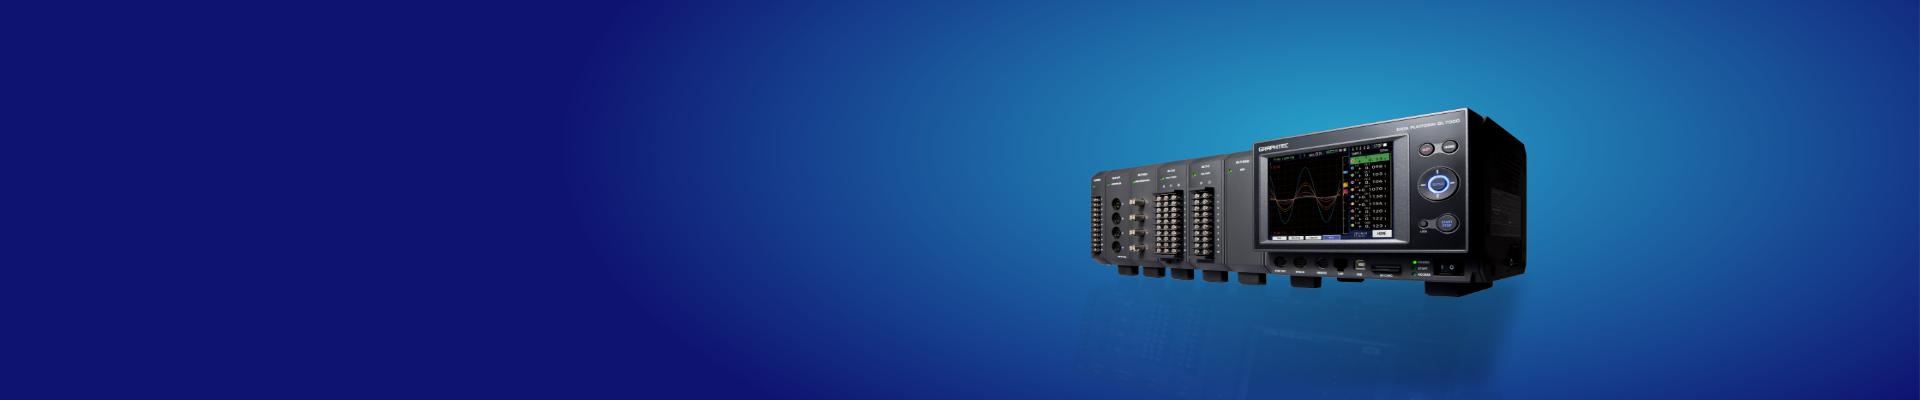 Graphtec Instruments GL7000 Data Platform